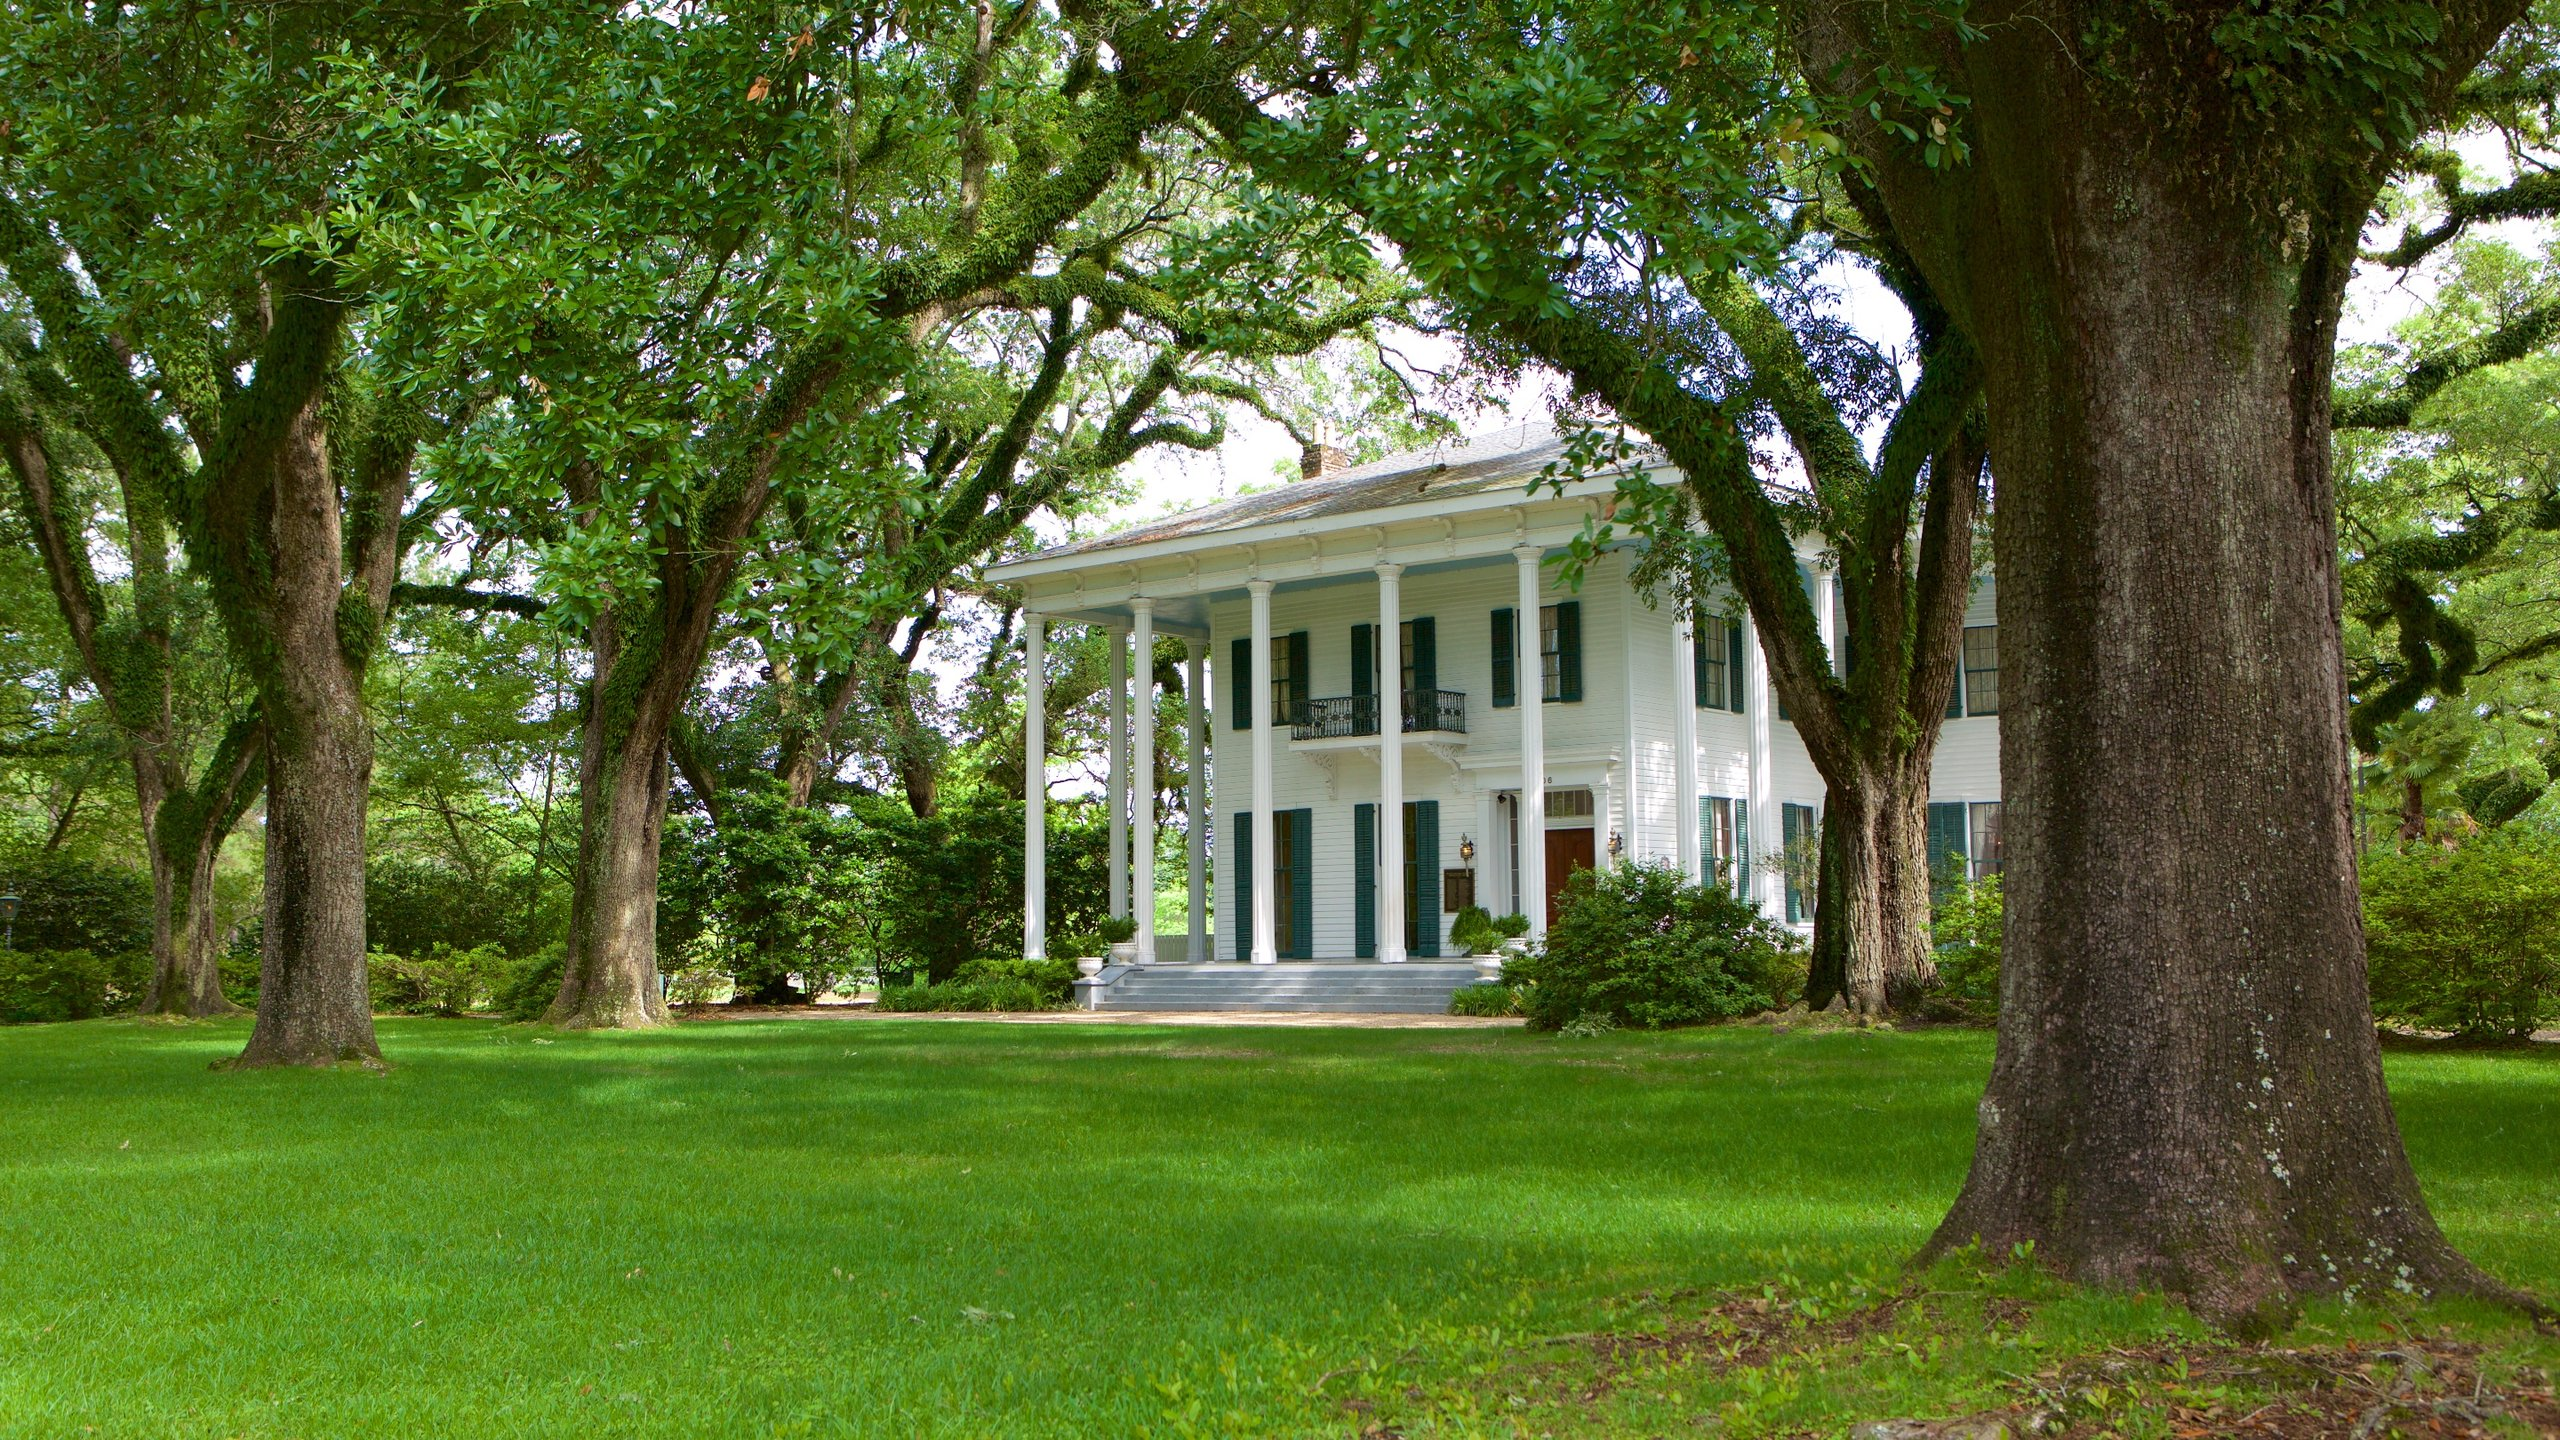 Bragg-Mitchell Mansion, Mobile, Alabama, United States of America